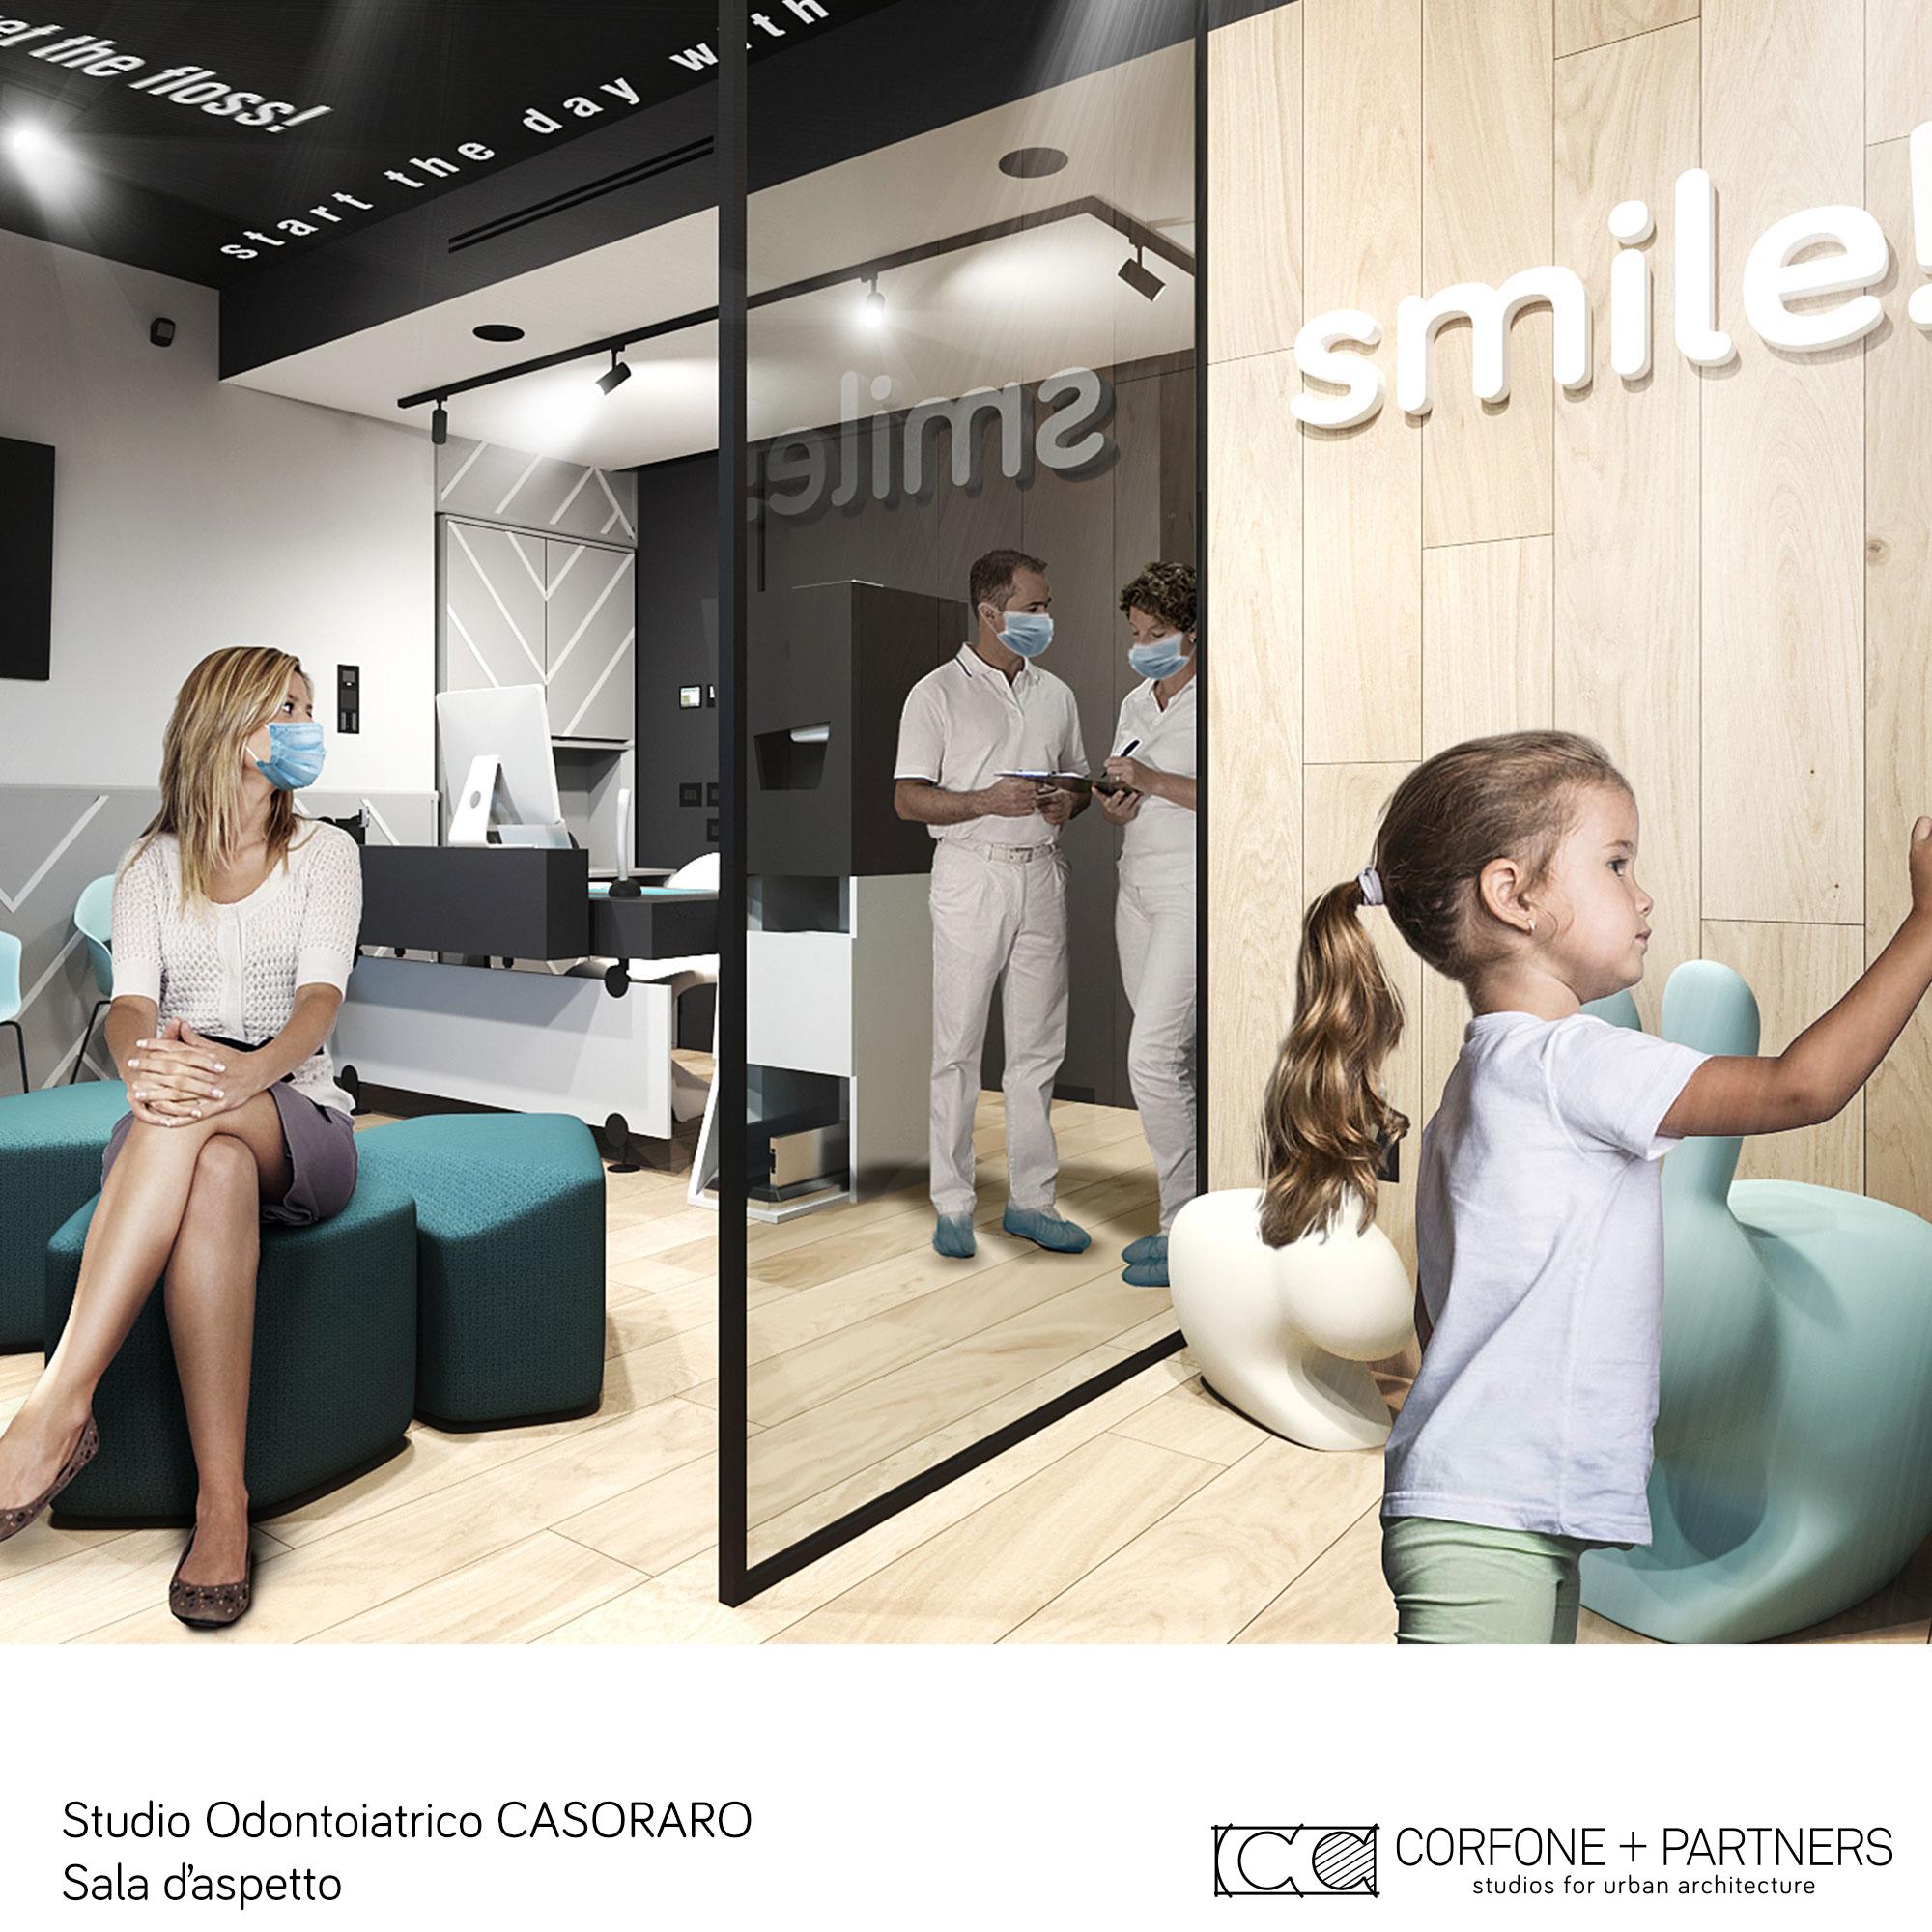 Progetto-Studio-Odontoiatrico-CASORARO-Pescara - 06